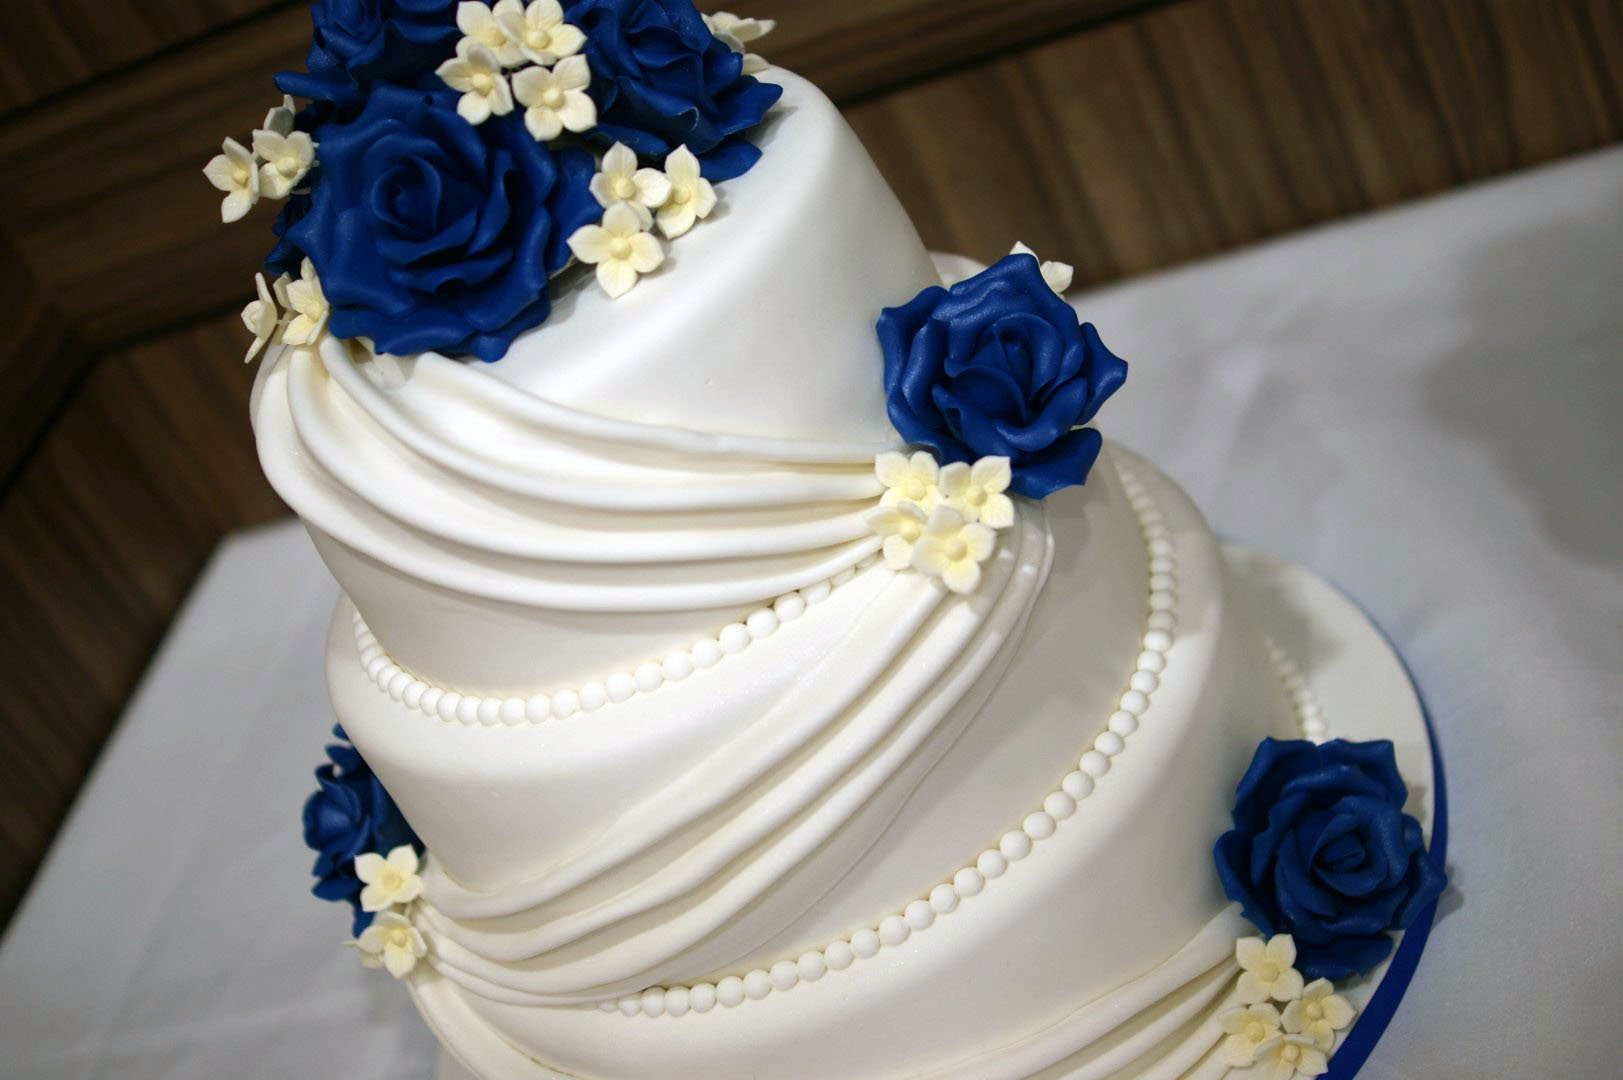 Wedding Cake Recipes For Tiered Cakes  Three tier wedding cake recipe idea in 2017